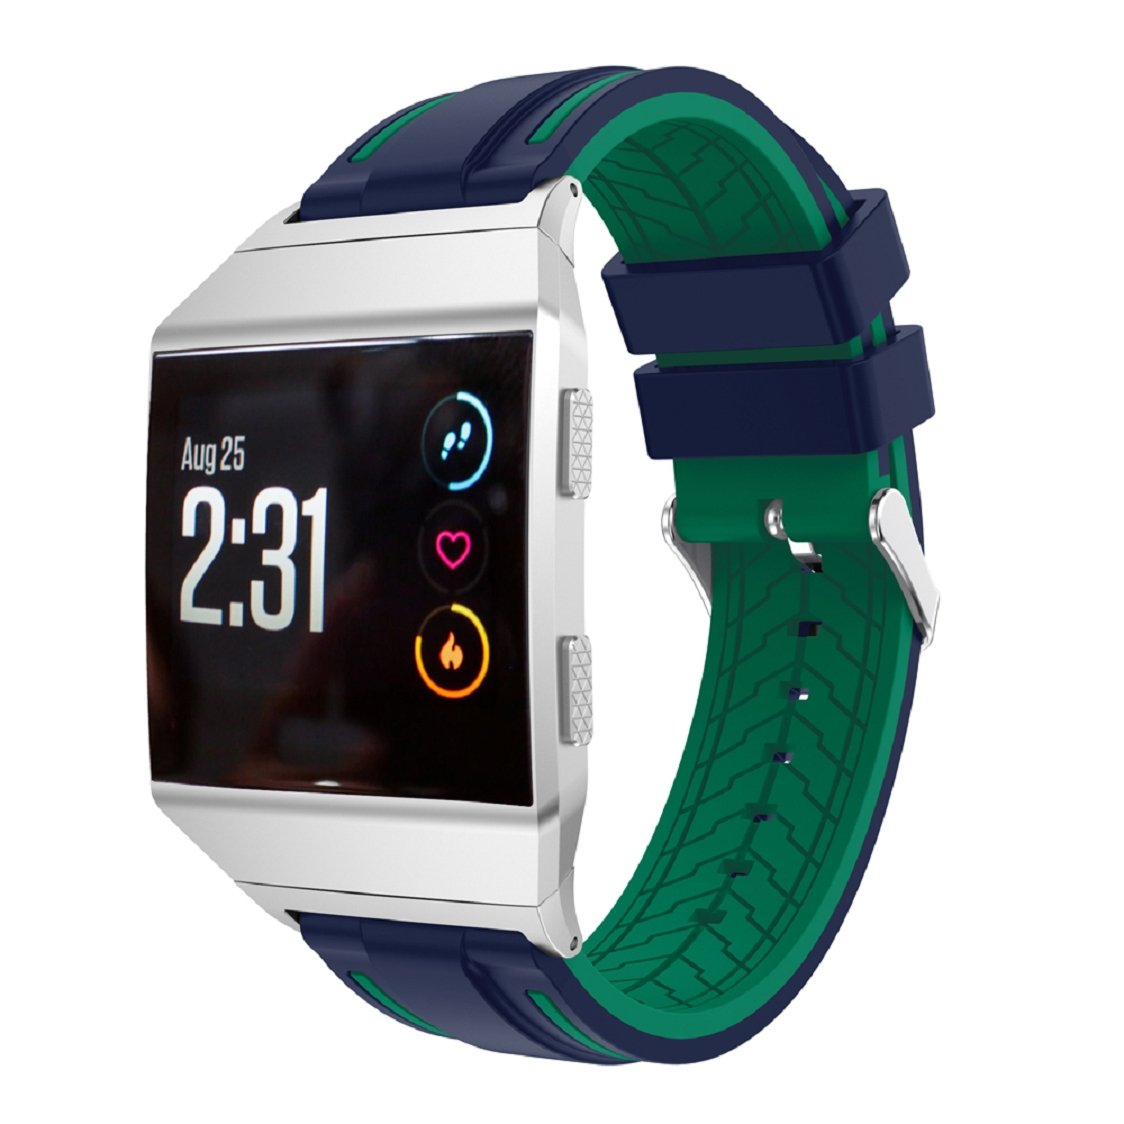 WensLTD for Fitbit Ionicバンド、ソフトシリコン交換用スポーツバンドFitbit Ionic腕時計 I I B0765S5TYJ